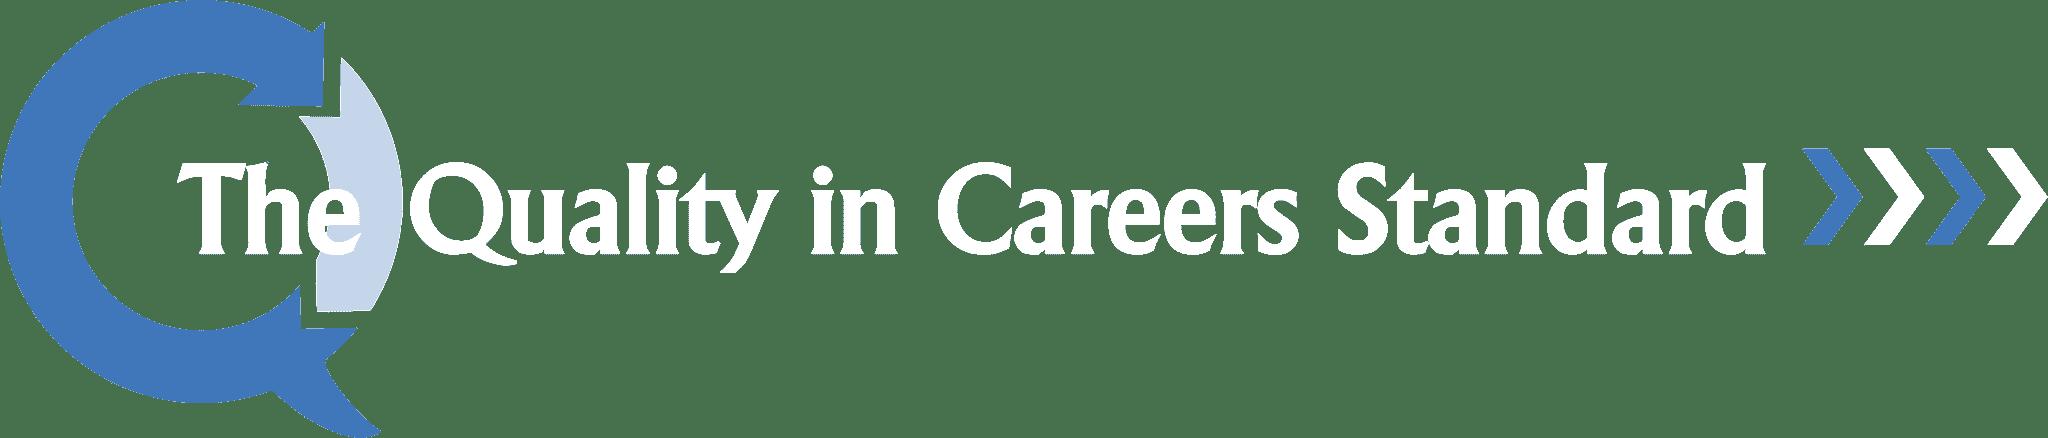 Quality careers logo